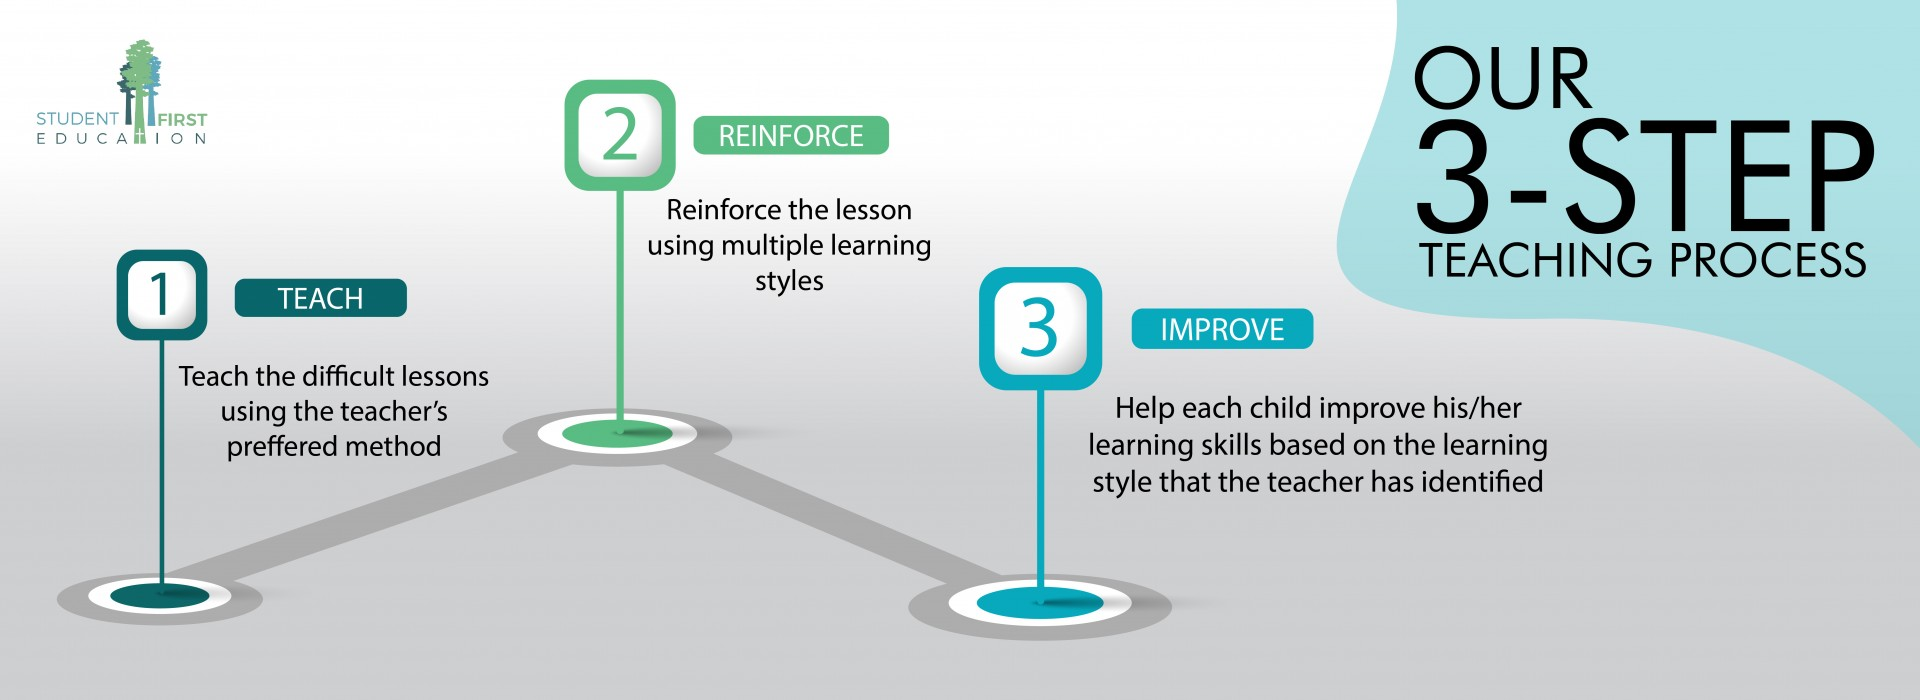 3-Step Teaching Process